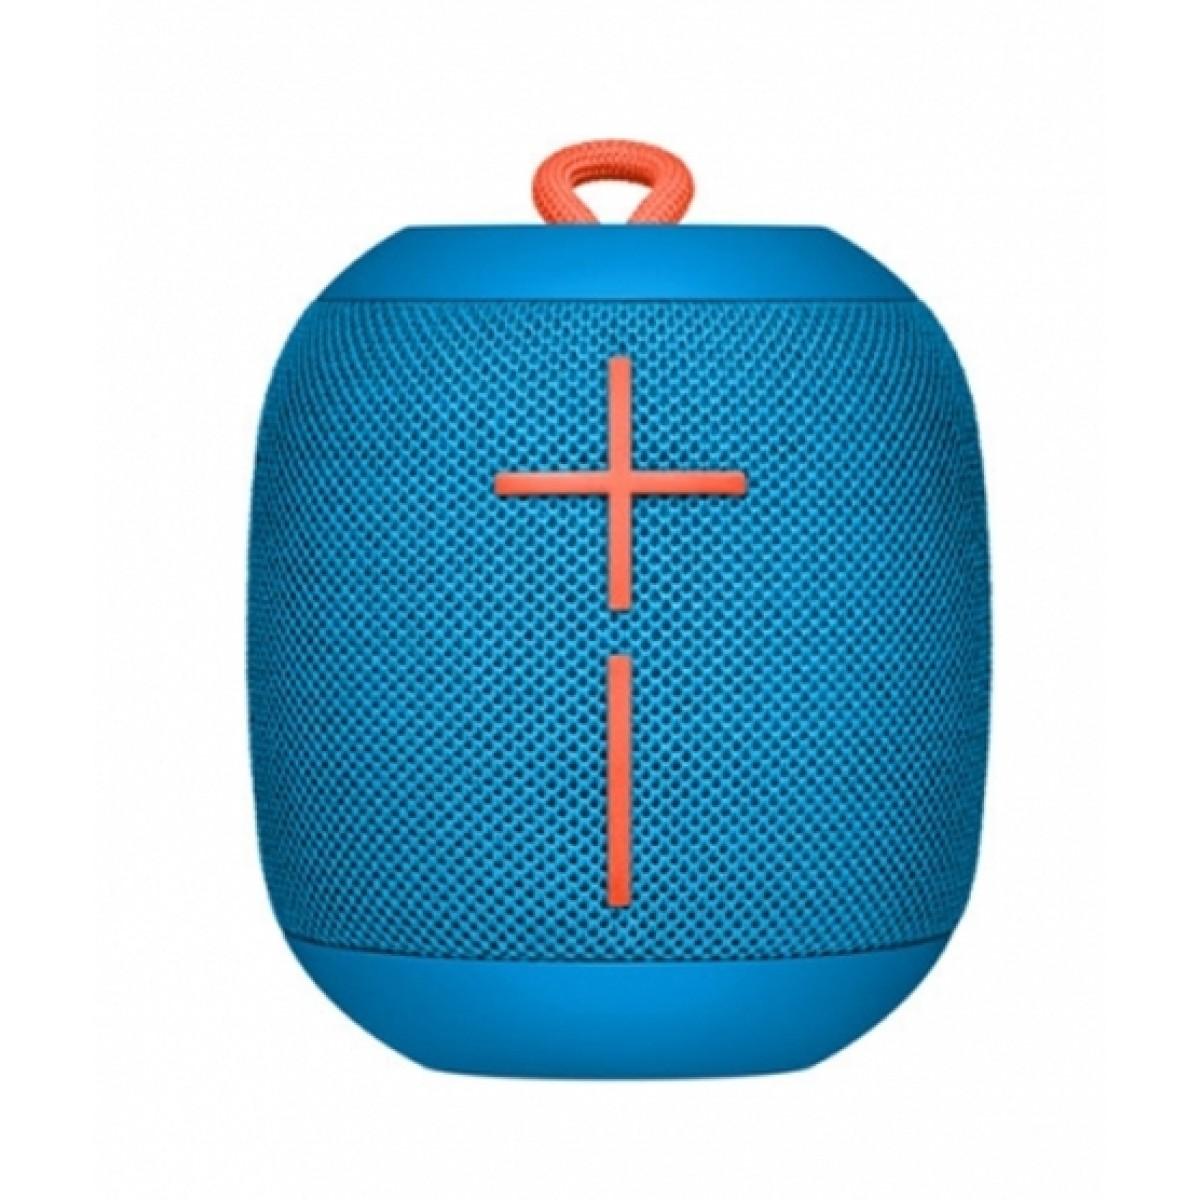 Logitech Ultimate Ears Wonderboom Portable Bluetooth Speaker Blue (984-000870)